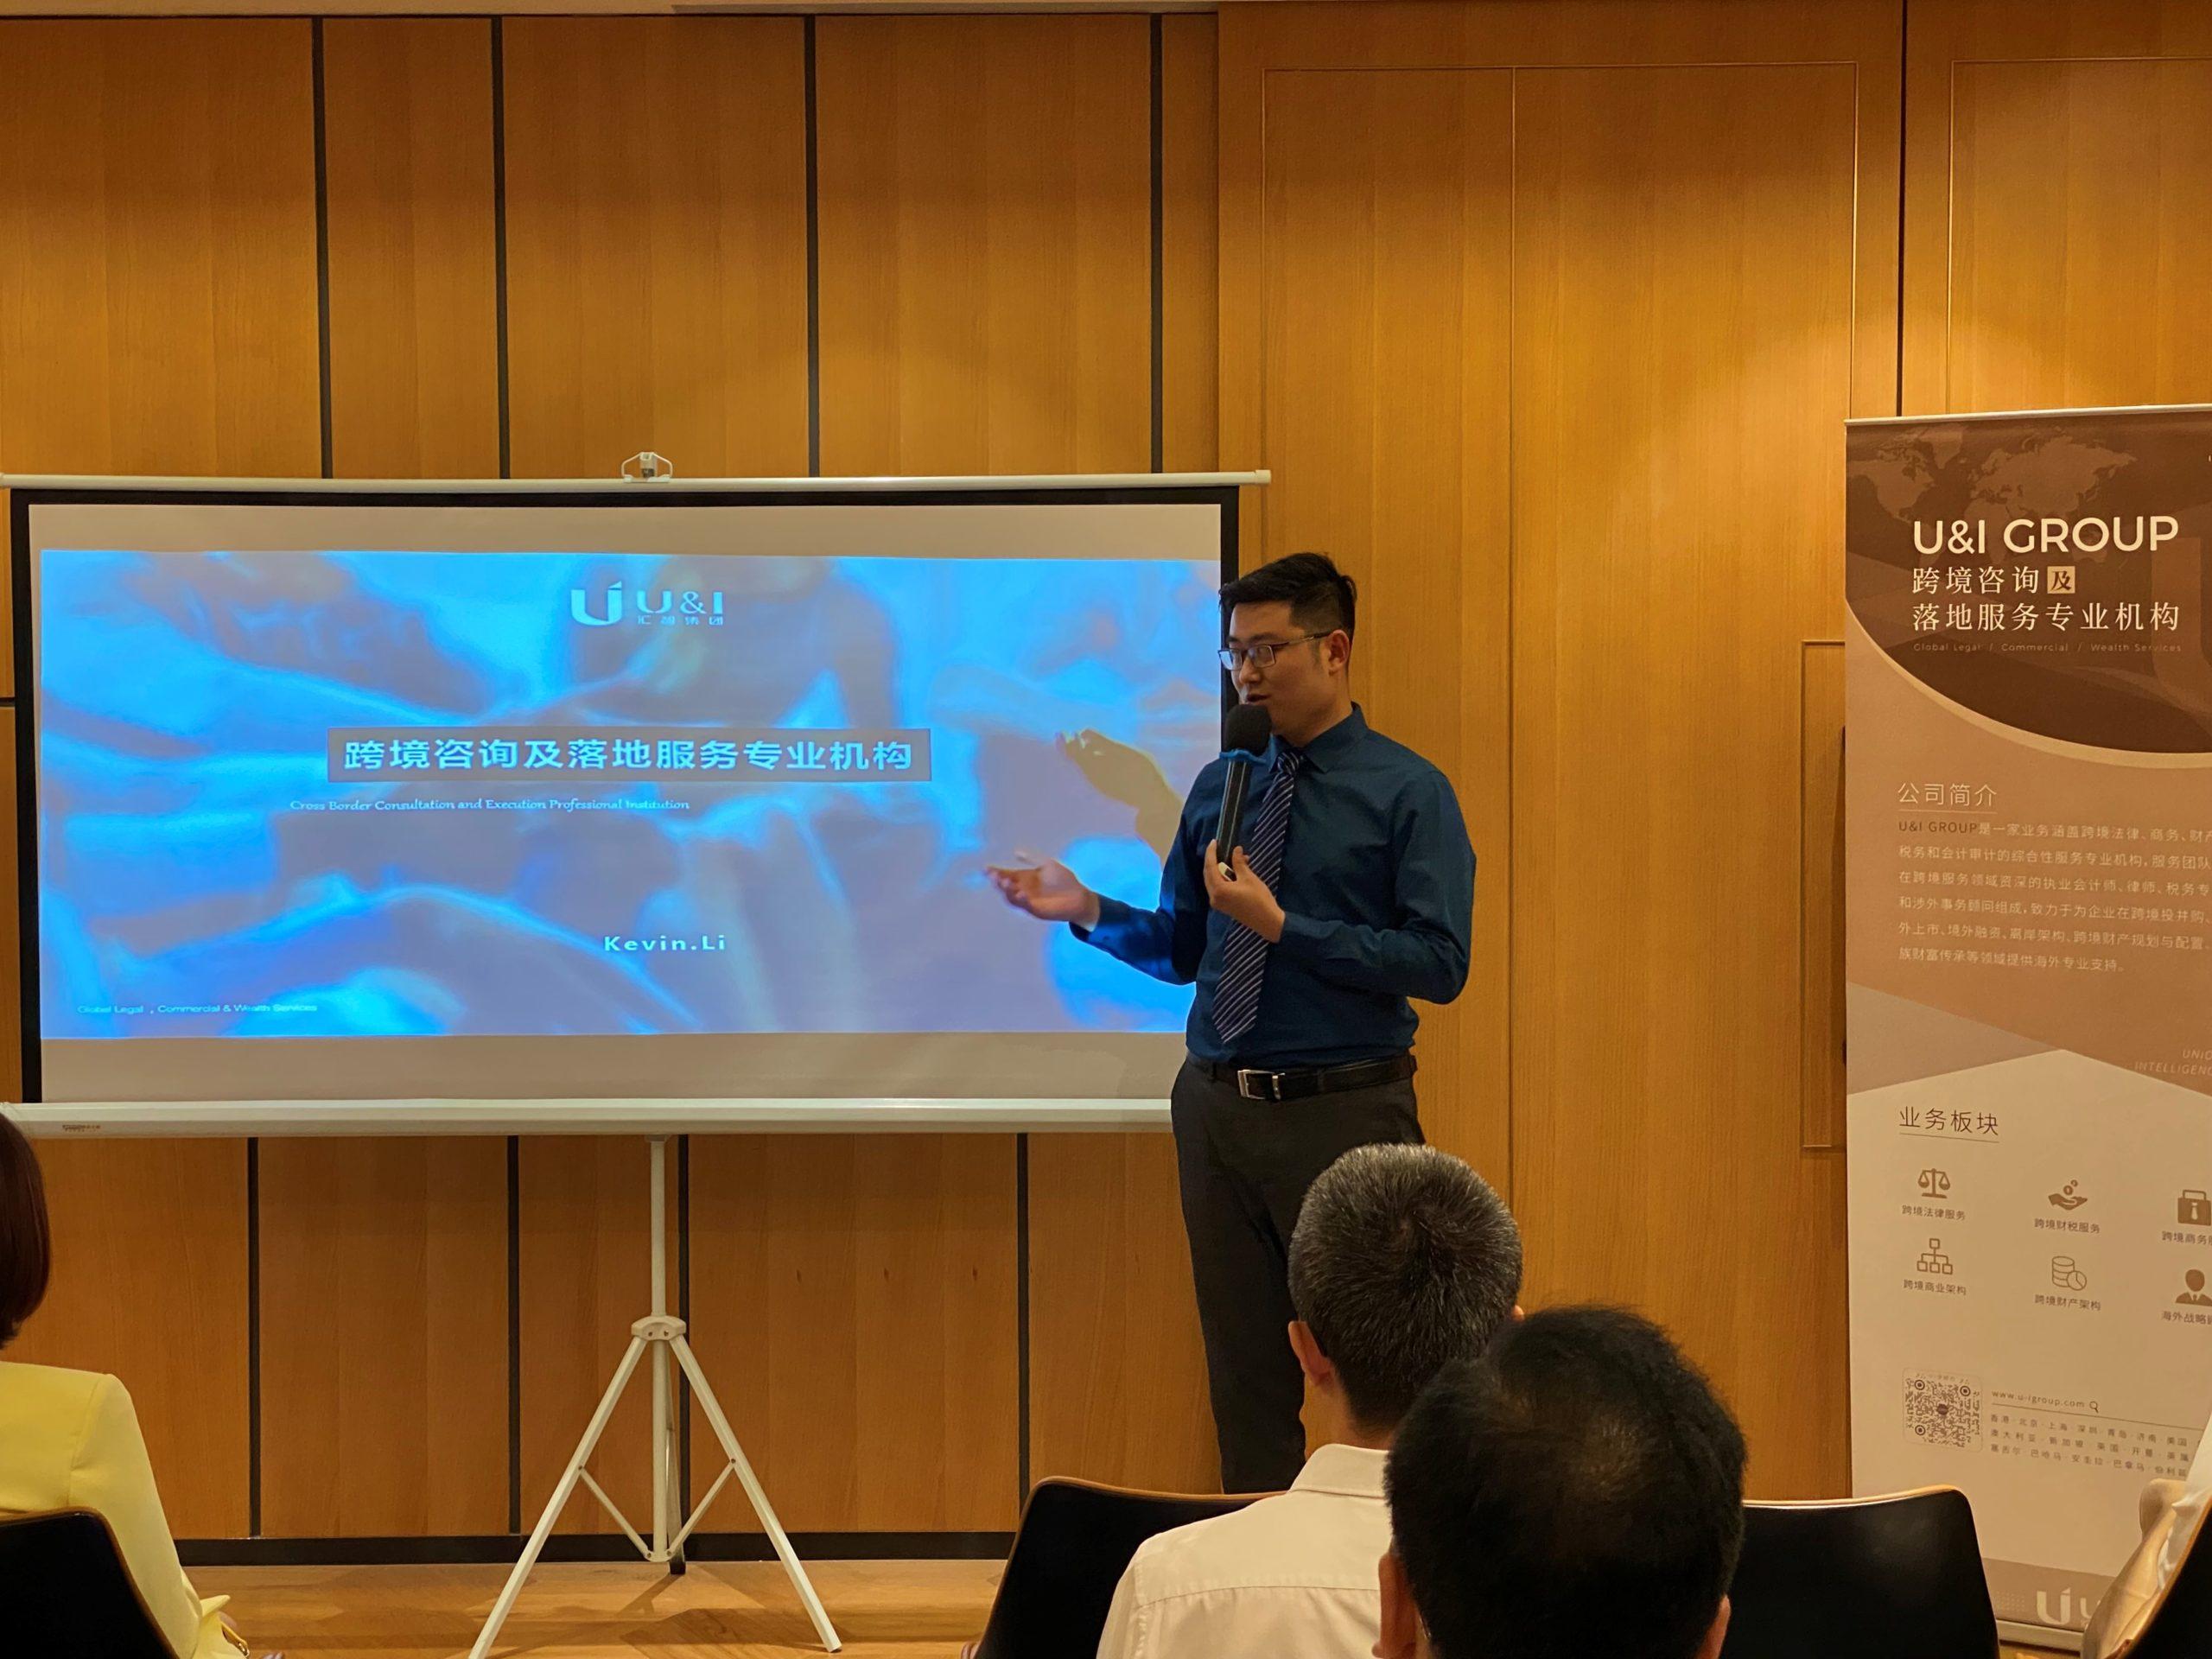 U&I Group Think Tank(汇智思库)在京成功举办,深化一期一会渠道合作